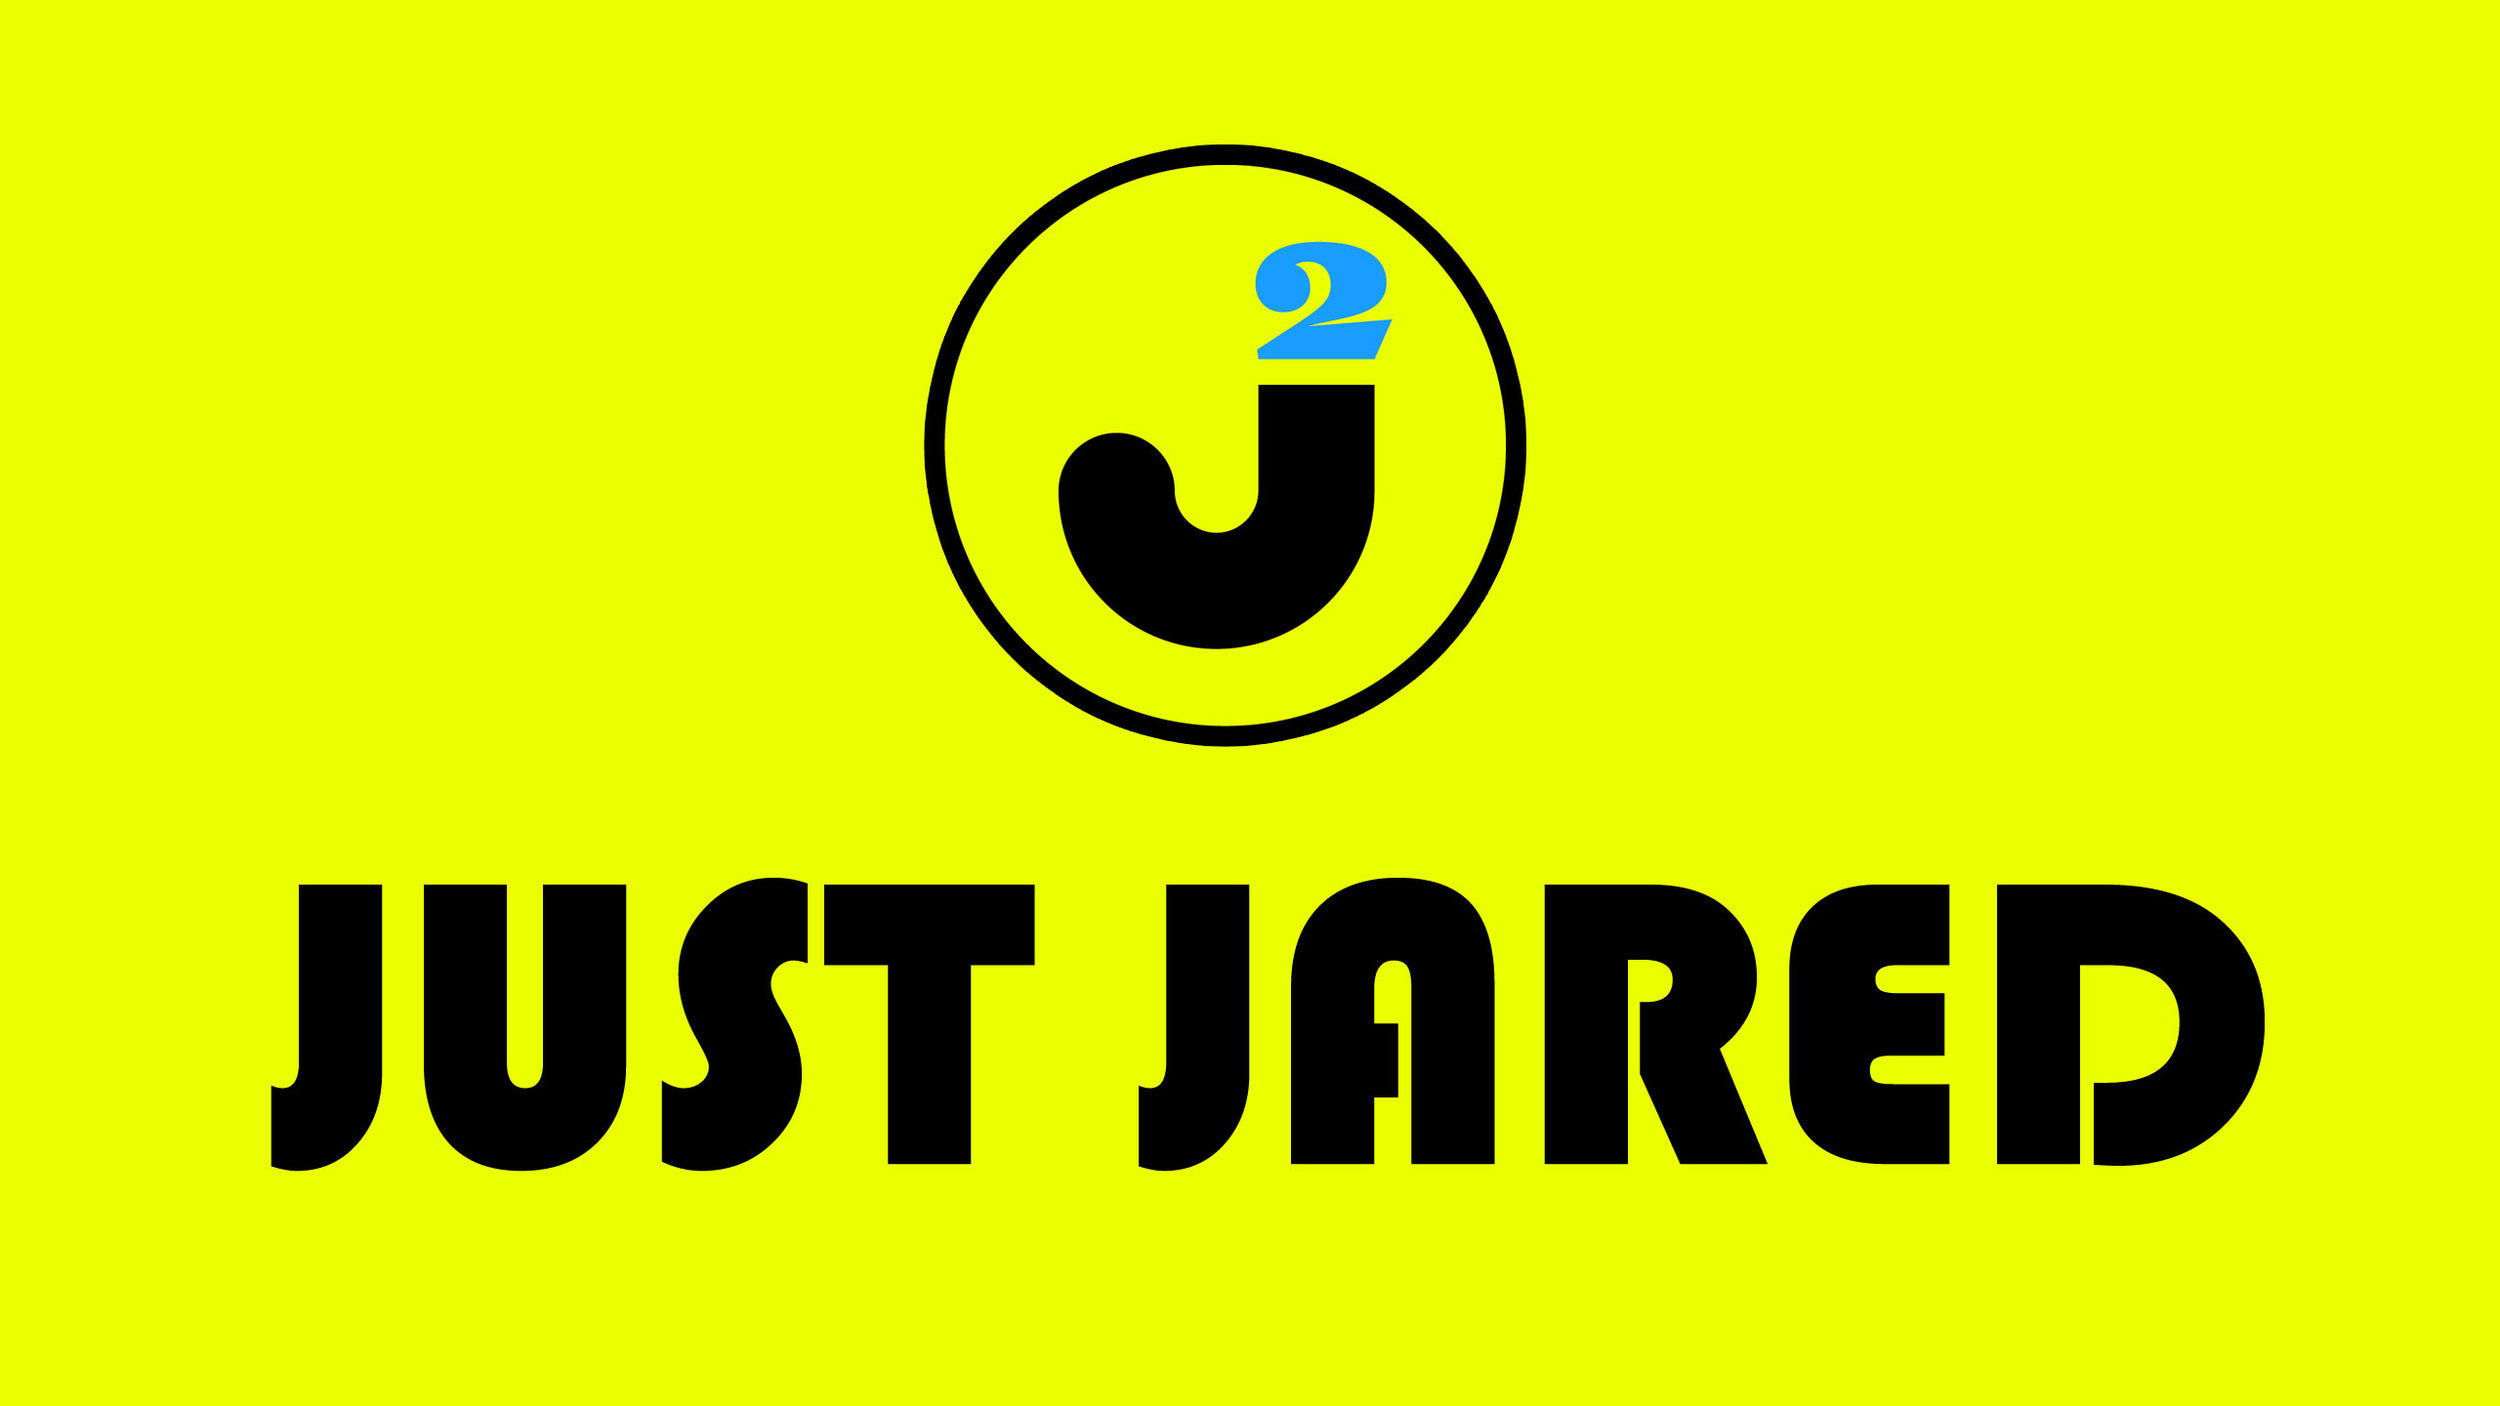 justjared-home.jpg